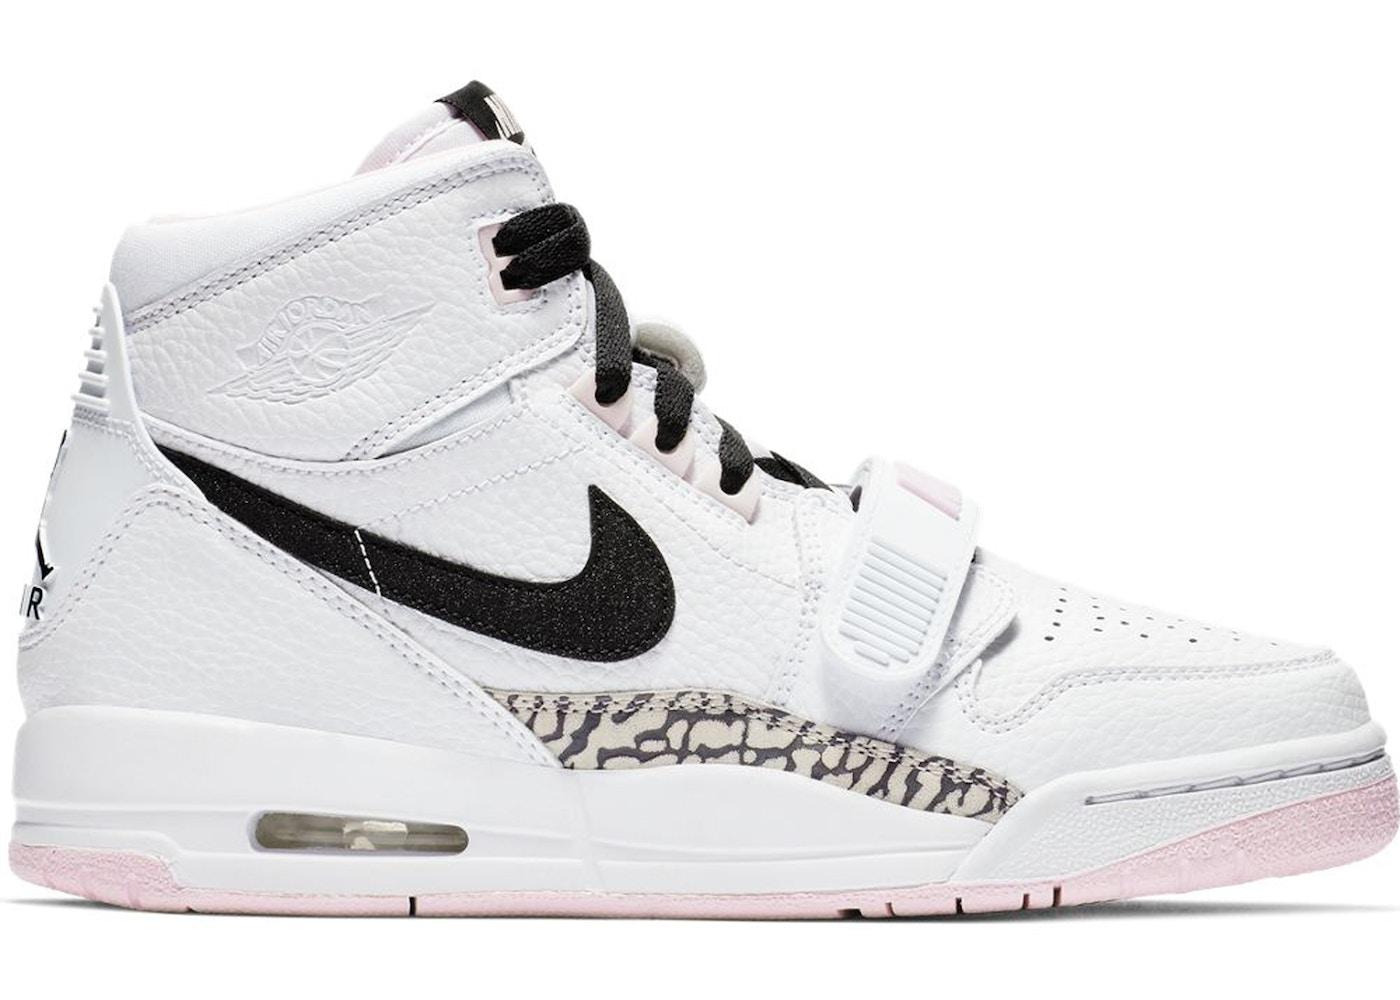 1ab5dcf8377 Jordan Legacy 312 White Black Pink Foam (GS) - AT4040-106